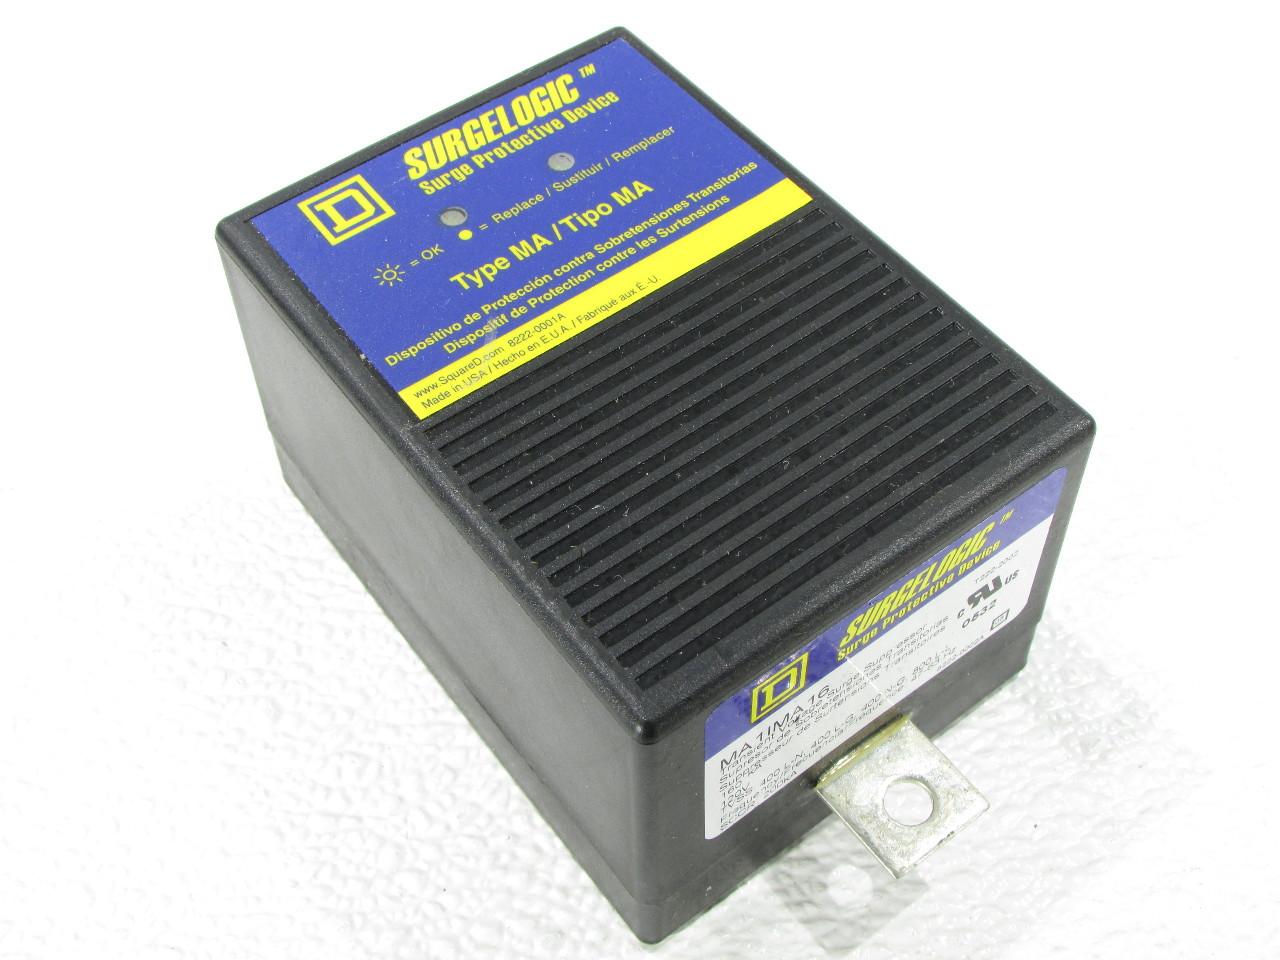 Square D Ma1ma16 Transient Surge Suppressor Surgelogic Premier Equipment Solutions Inc